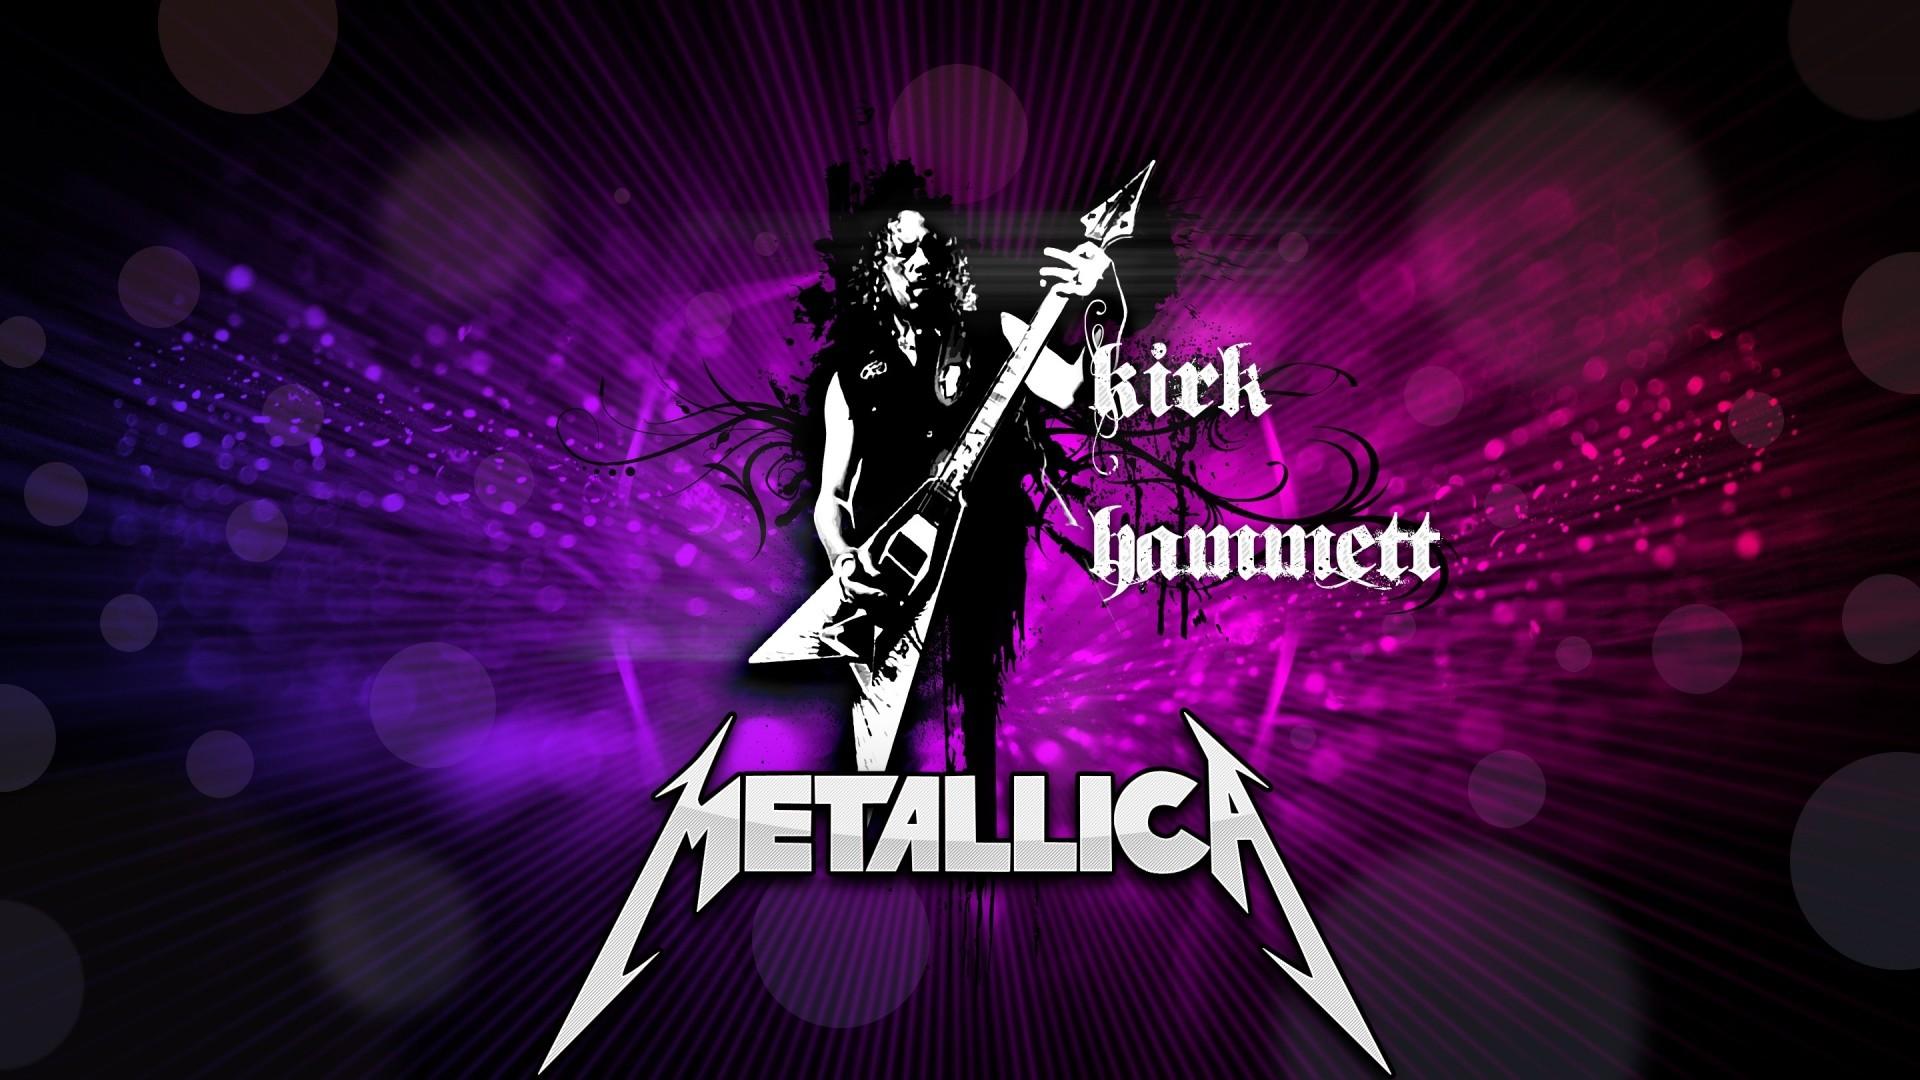 Metallica HD Background https://wallpapers-and-backgrounds.net/metallica